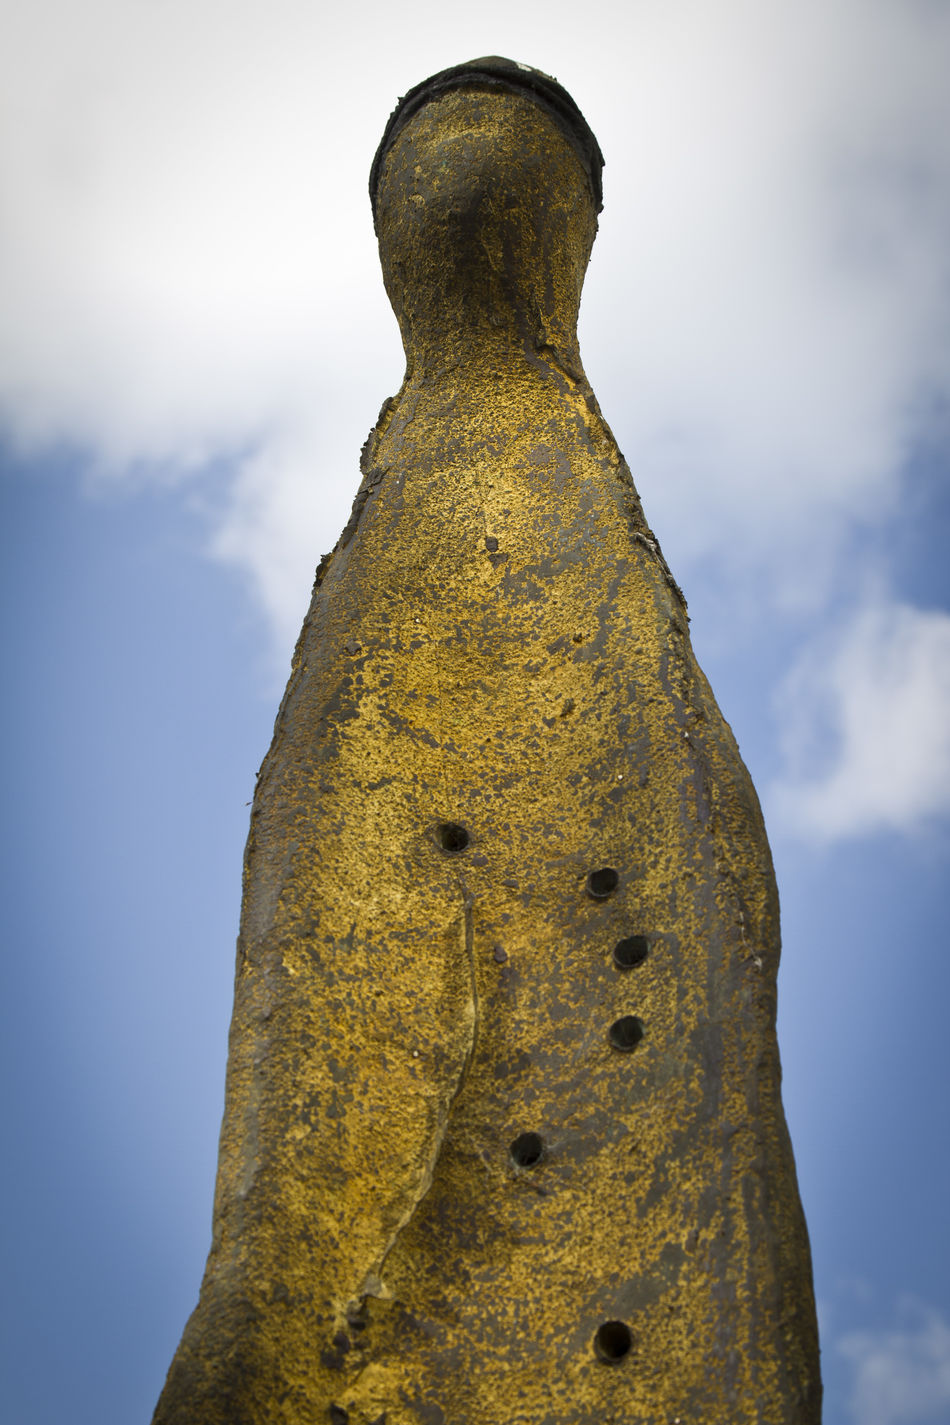 The Proclamation Sculptures, tribute to Irish martyrs, near the Kilmainham Gaol Ancient History Human Representation Memorial Monument Proclamation Sculpture Sculpture Sculptures Statue Statue The Past Three Quarter Length